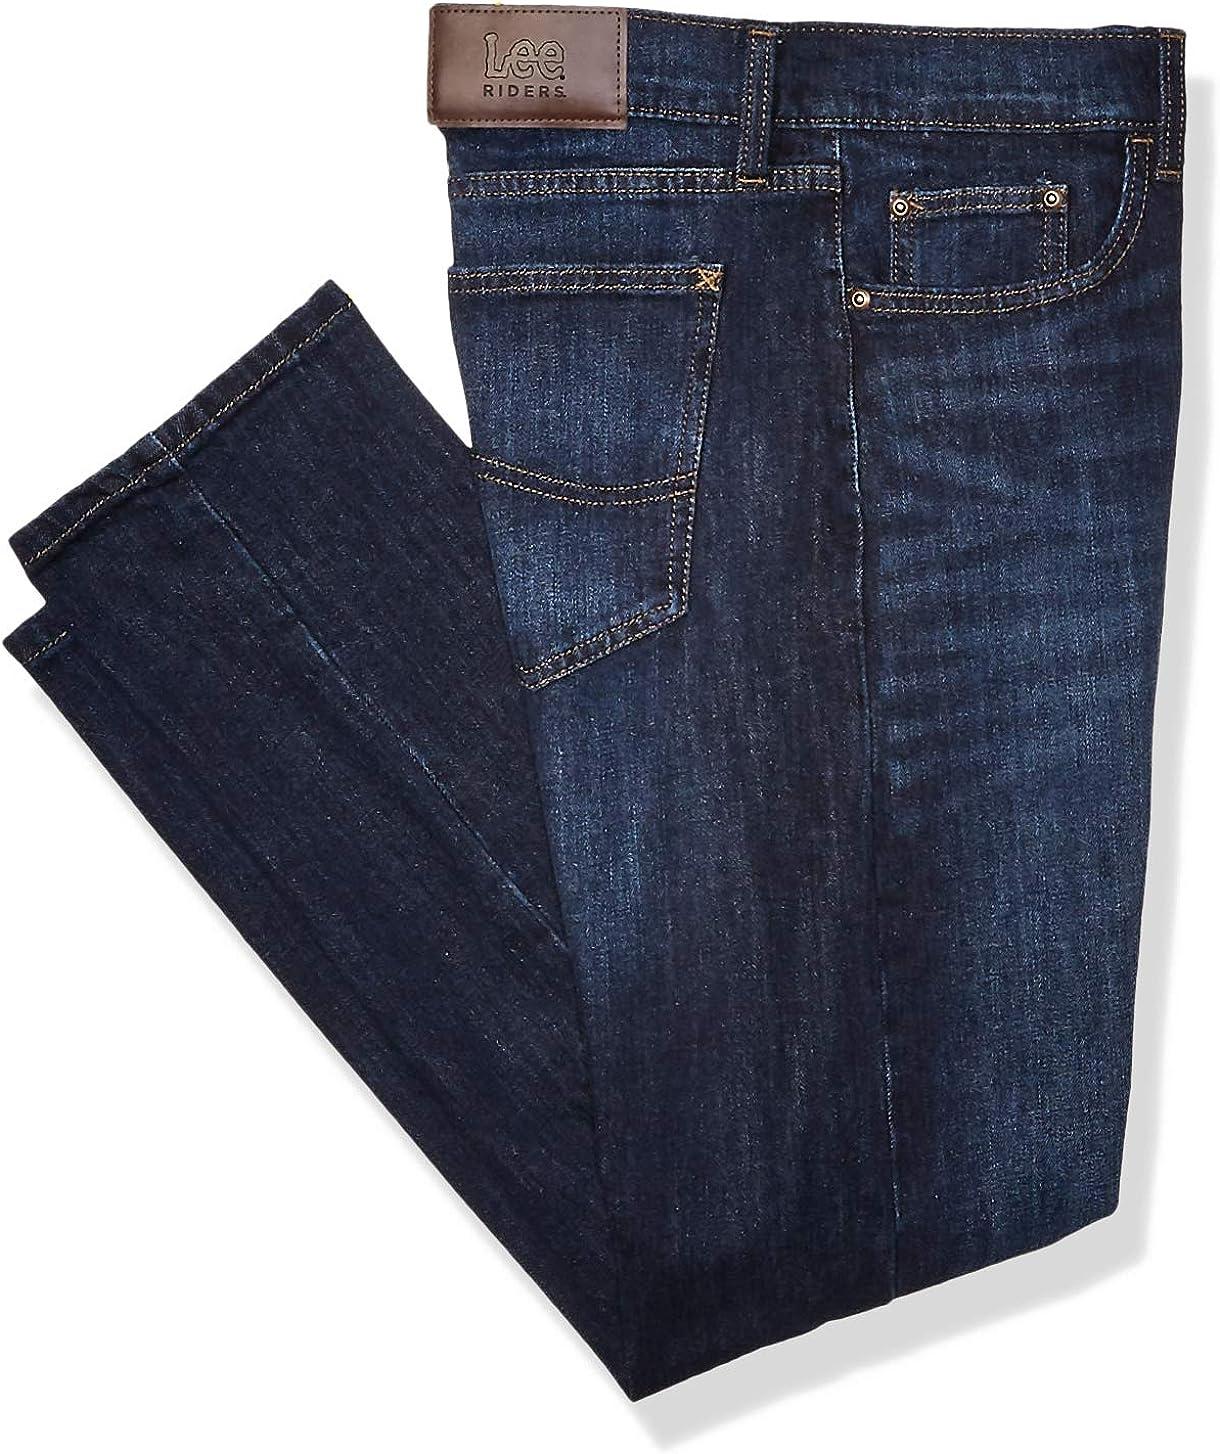 Lee Riders Indigo Mens Slim Straight Fit Jean Jeans